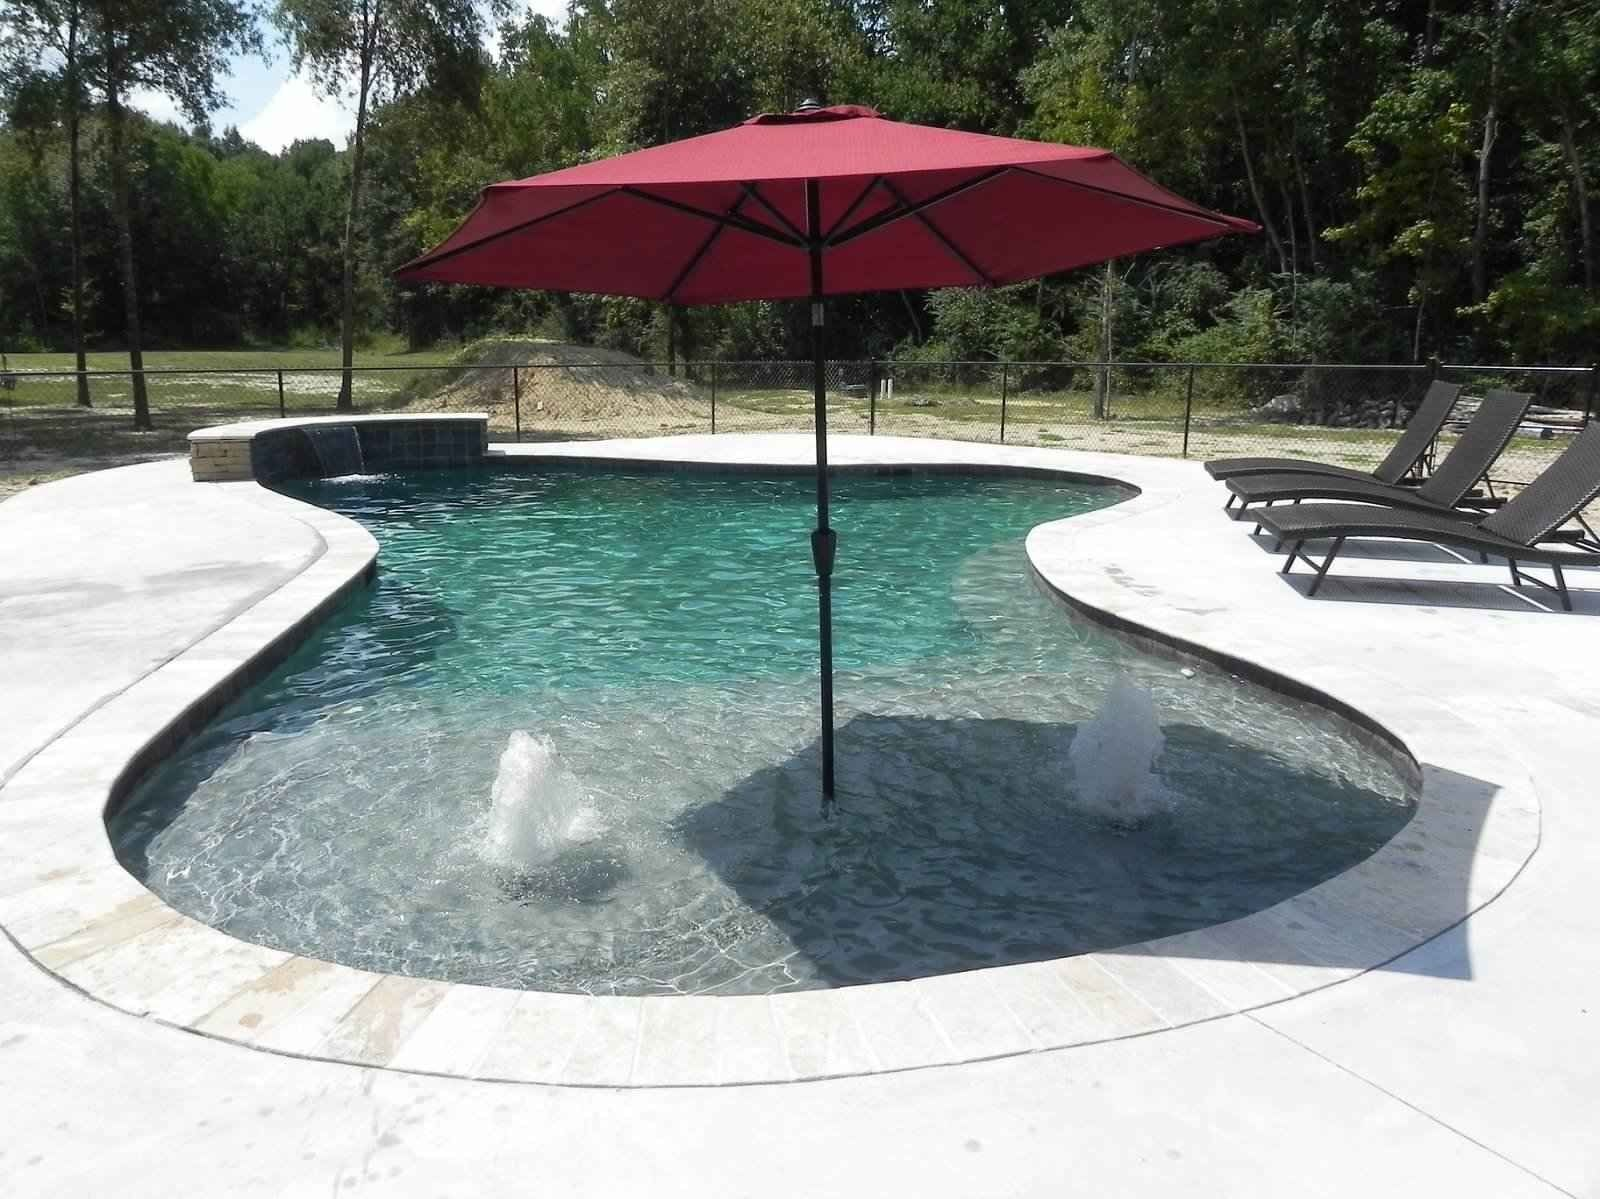 Swiming Pools Red Pool Umbrella With